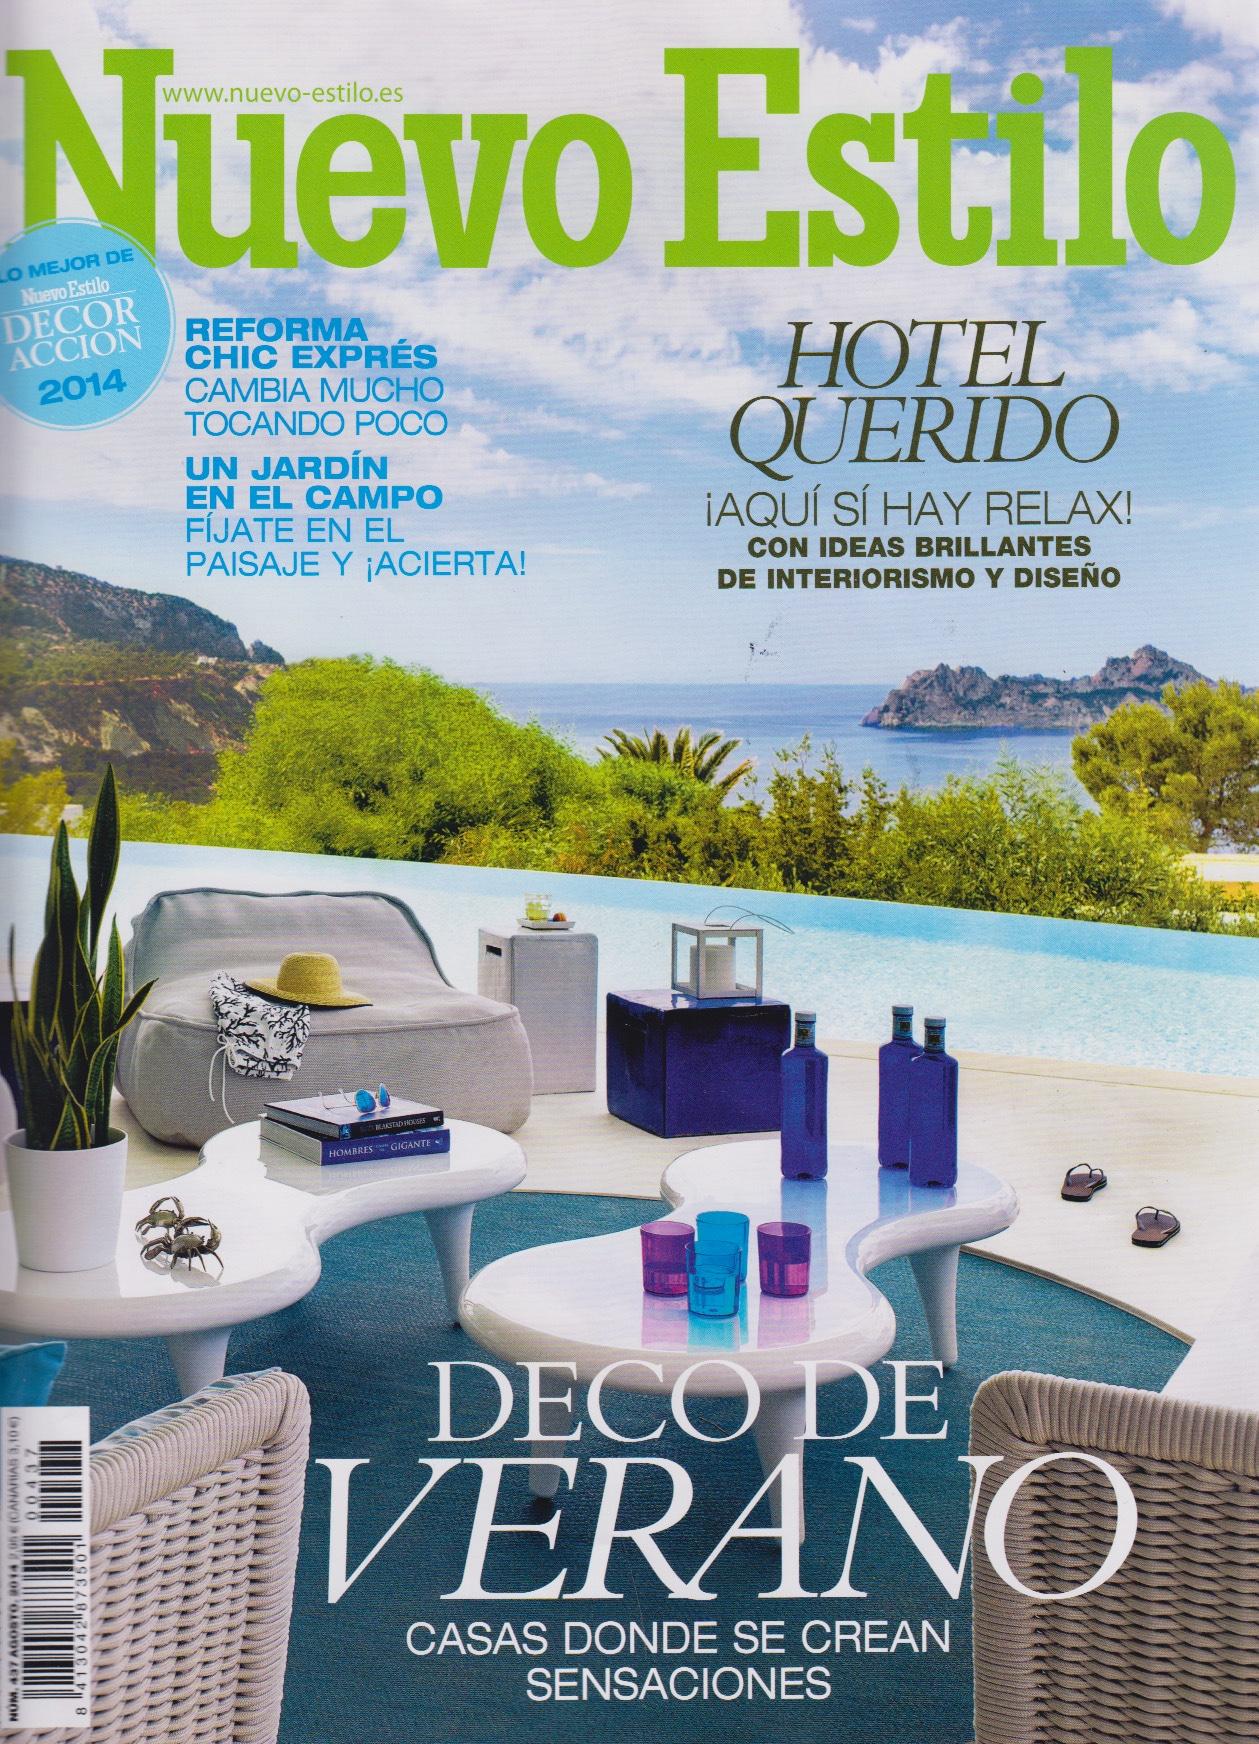 reportaje-nuevo_estilo-julio-2014-melian_randolph-ibiza-portada-0